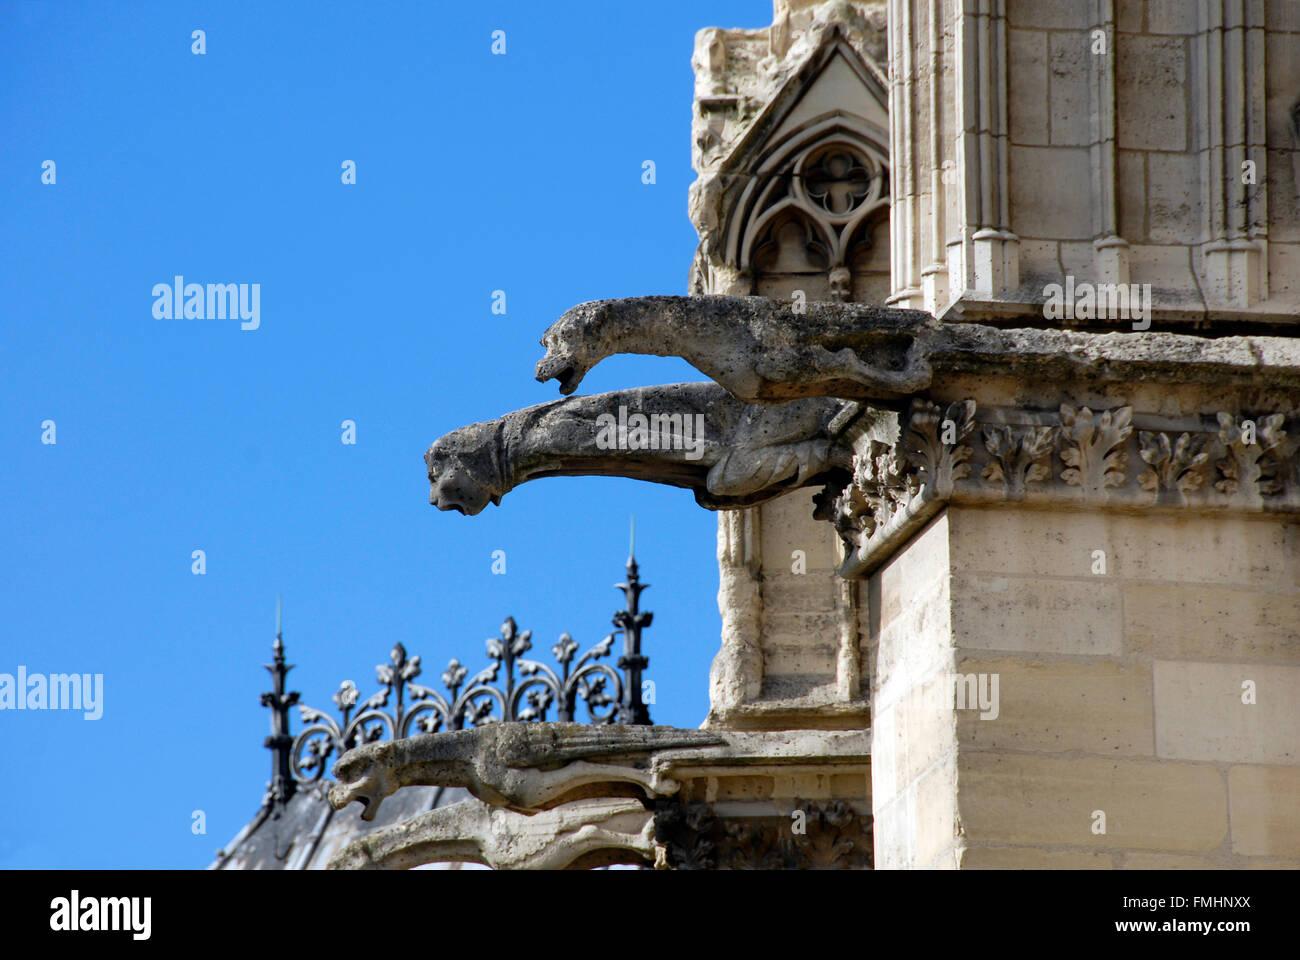 Gargoyles on Nôtre Dame Cathedral Paris - Stock Image